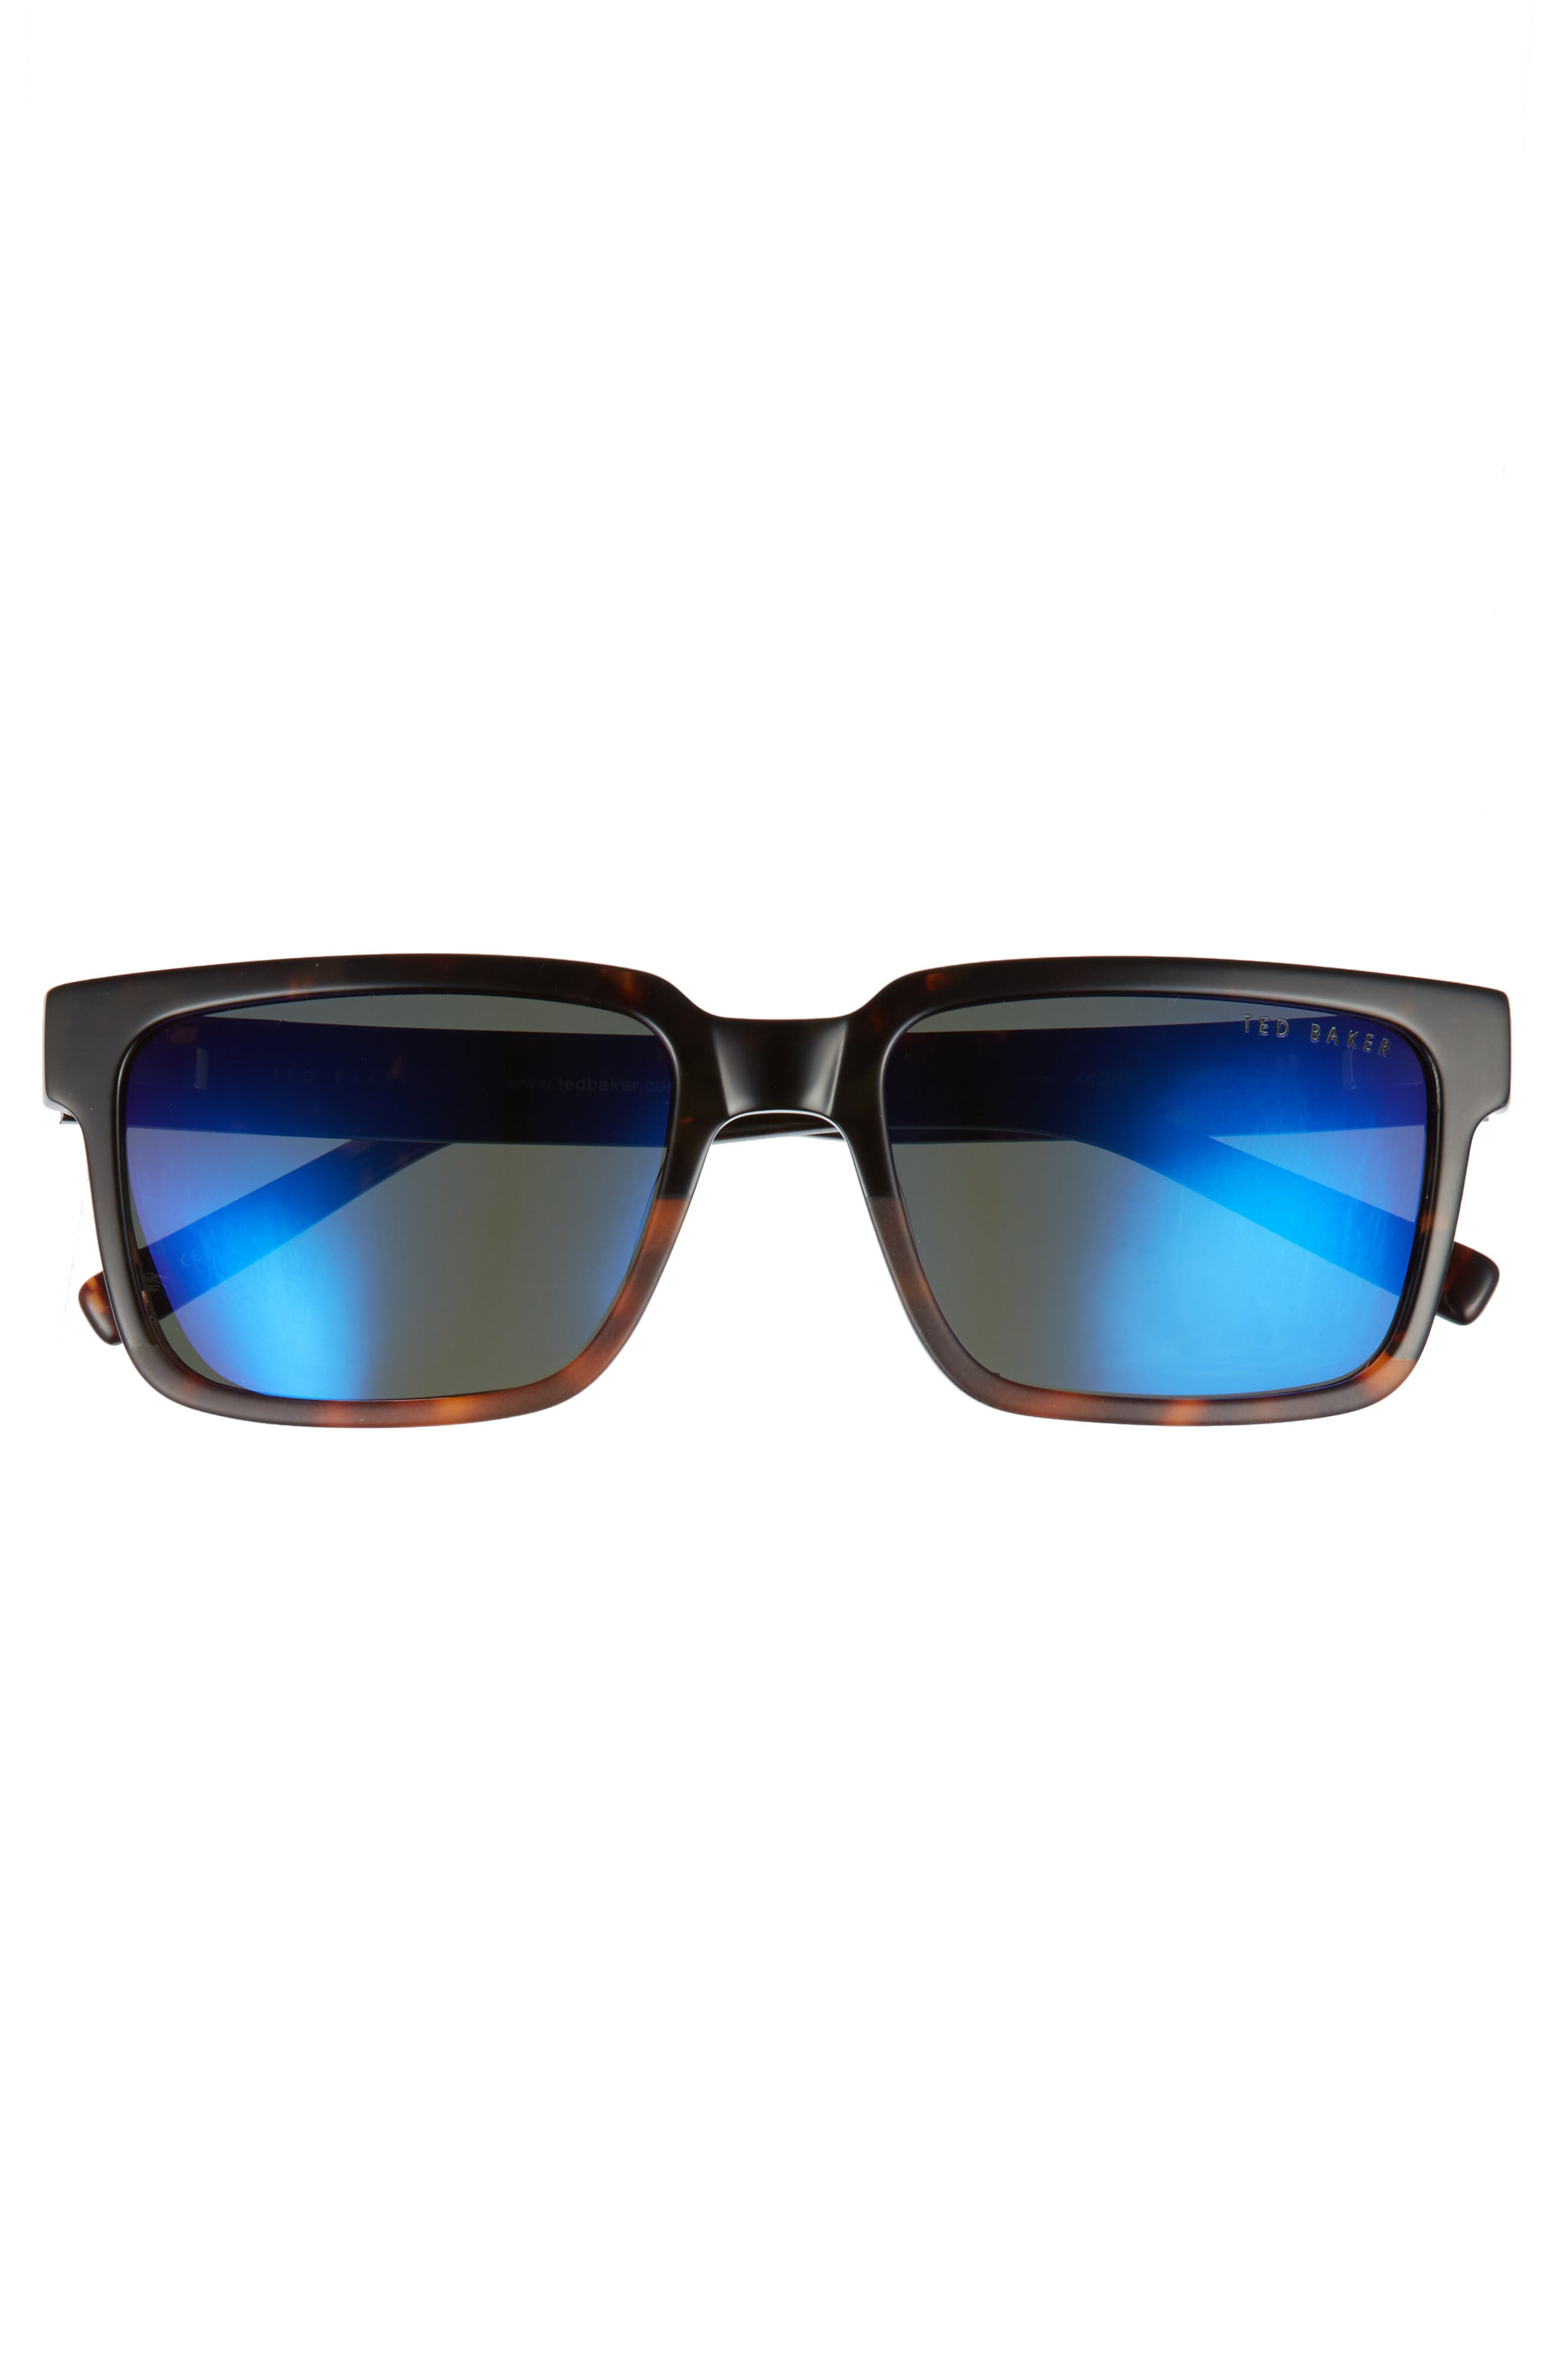 56mm Polarized Rectangular Sunglasses,                             Alternate thumbnail 2, color,                             Tortoise